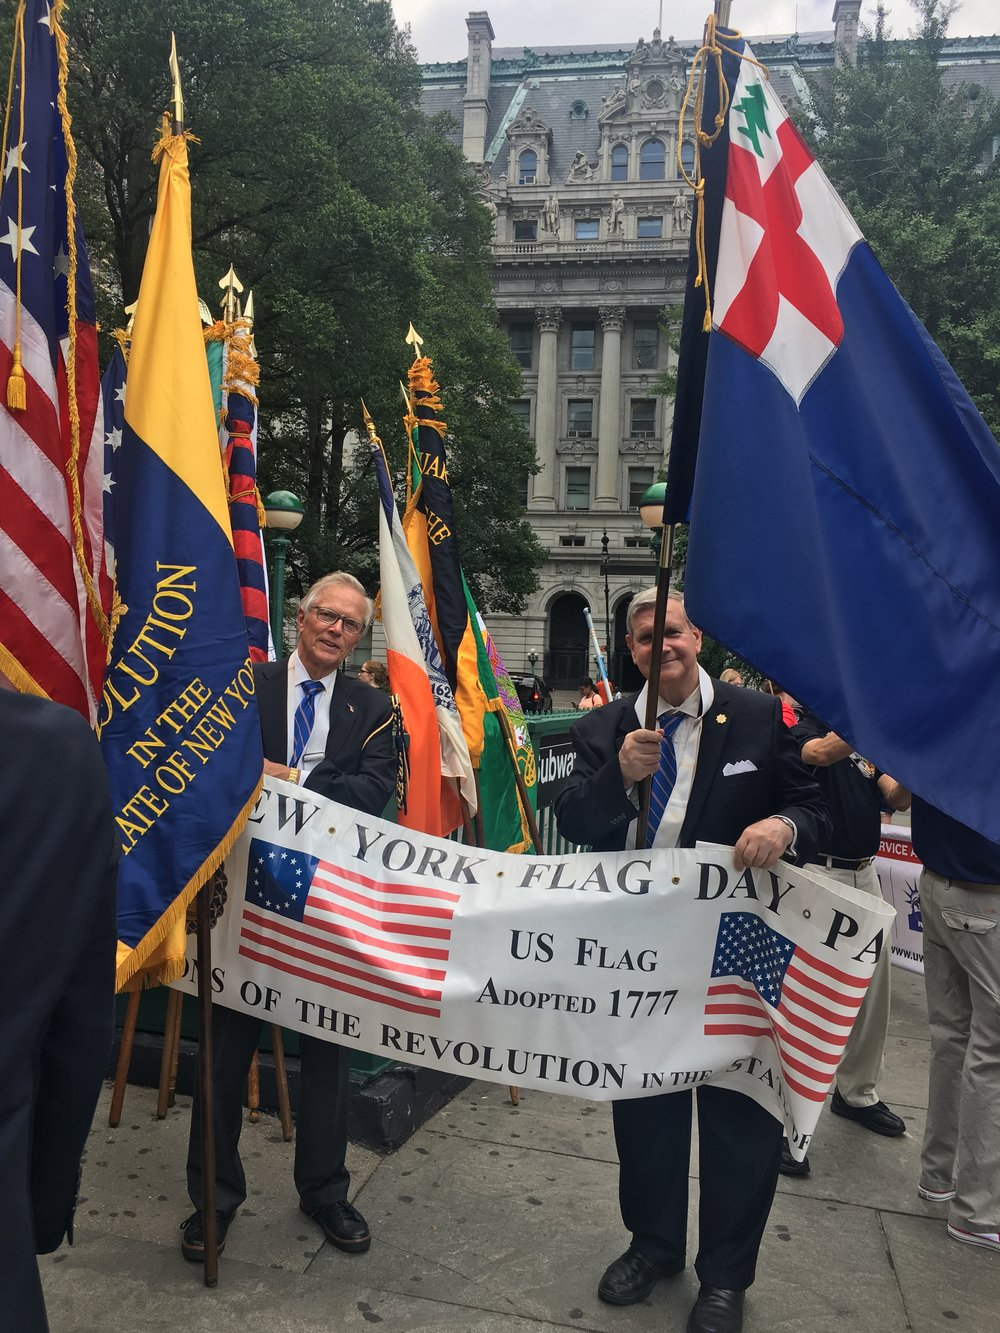 FlagDay201710.JPG